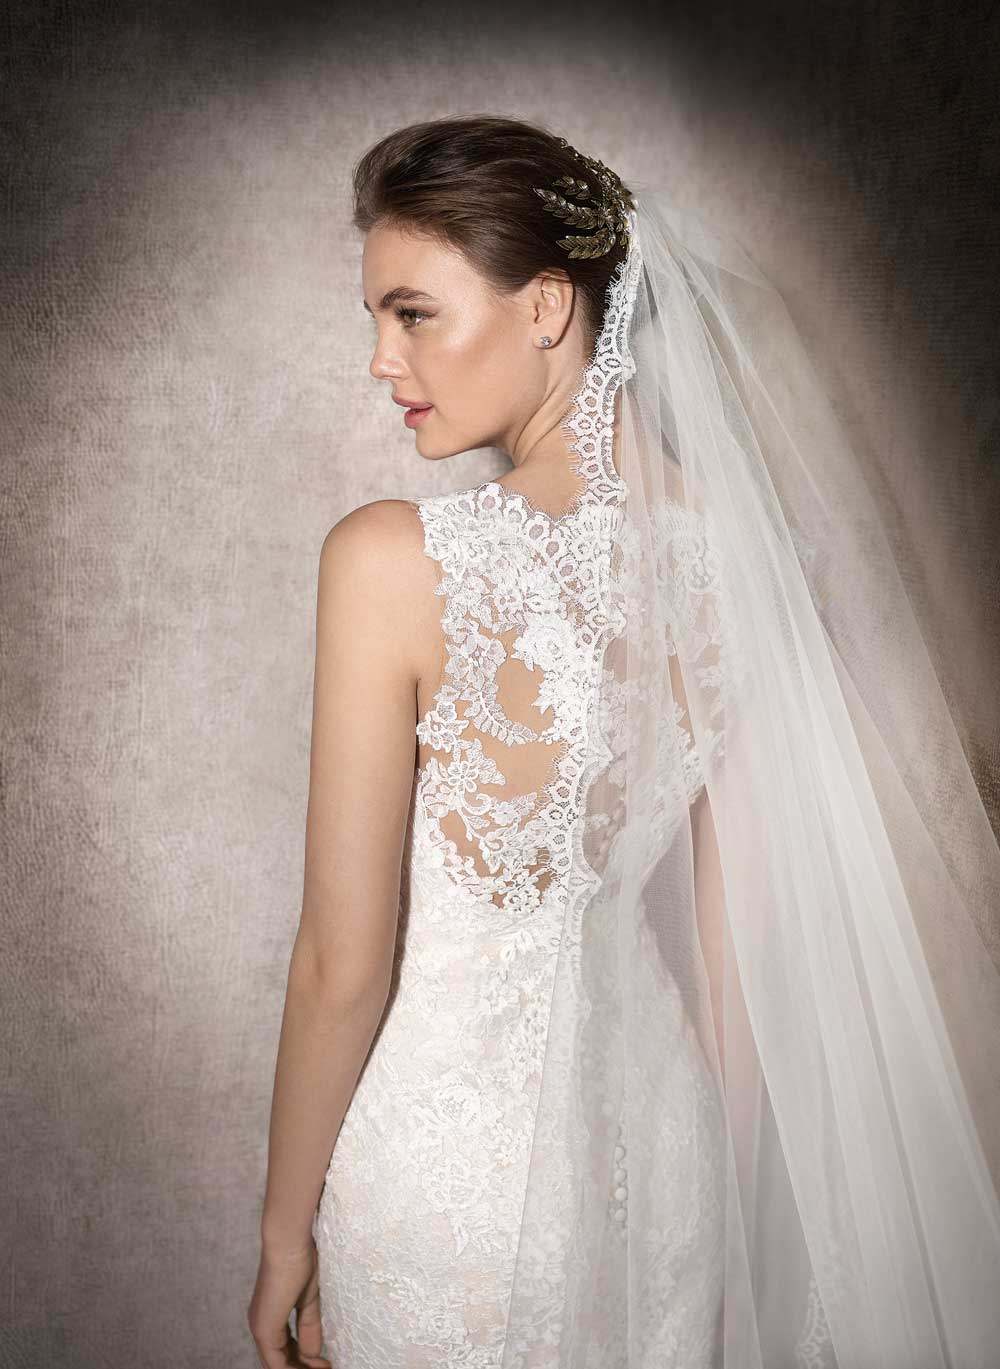 High lace back wedding dress